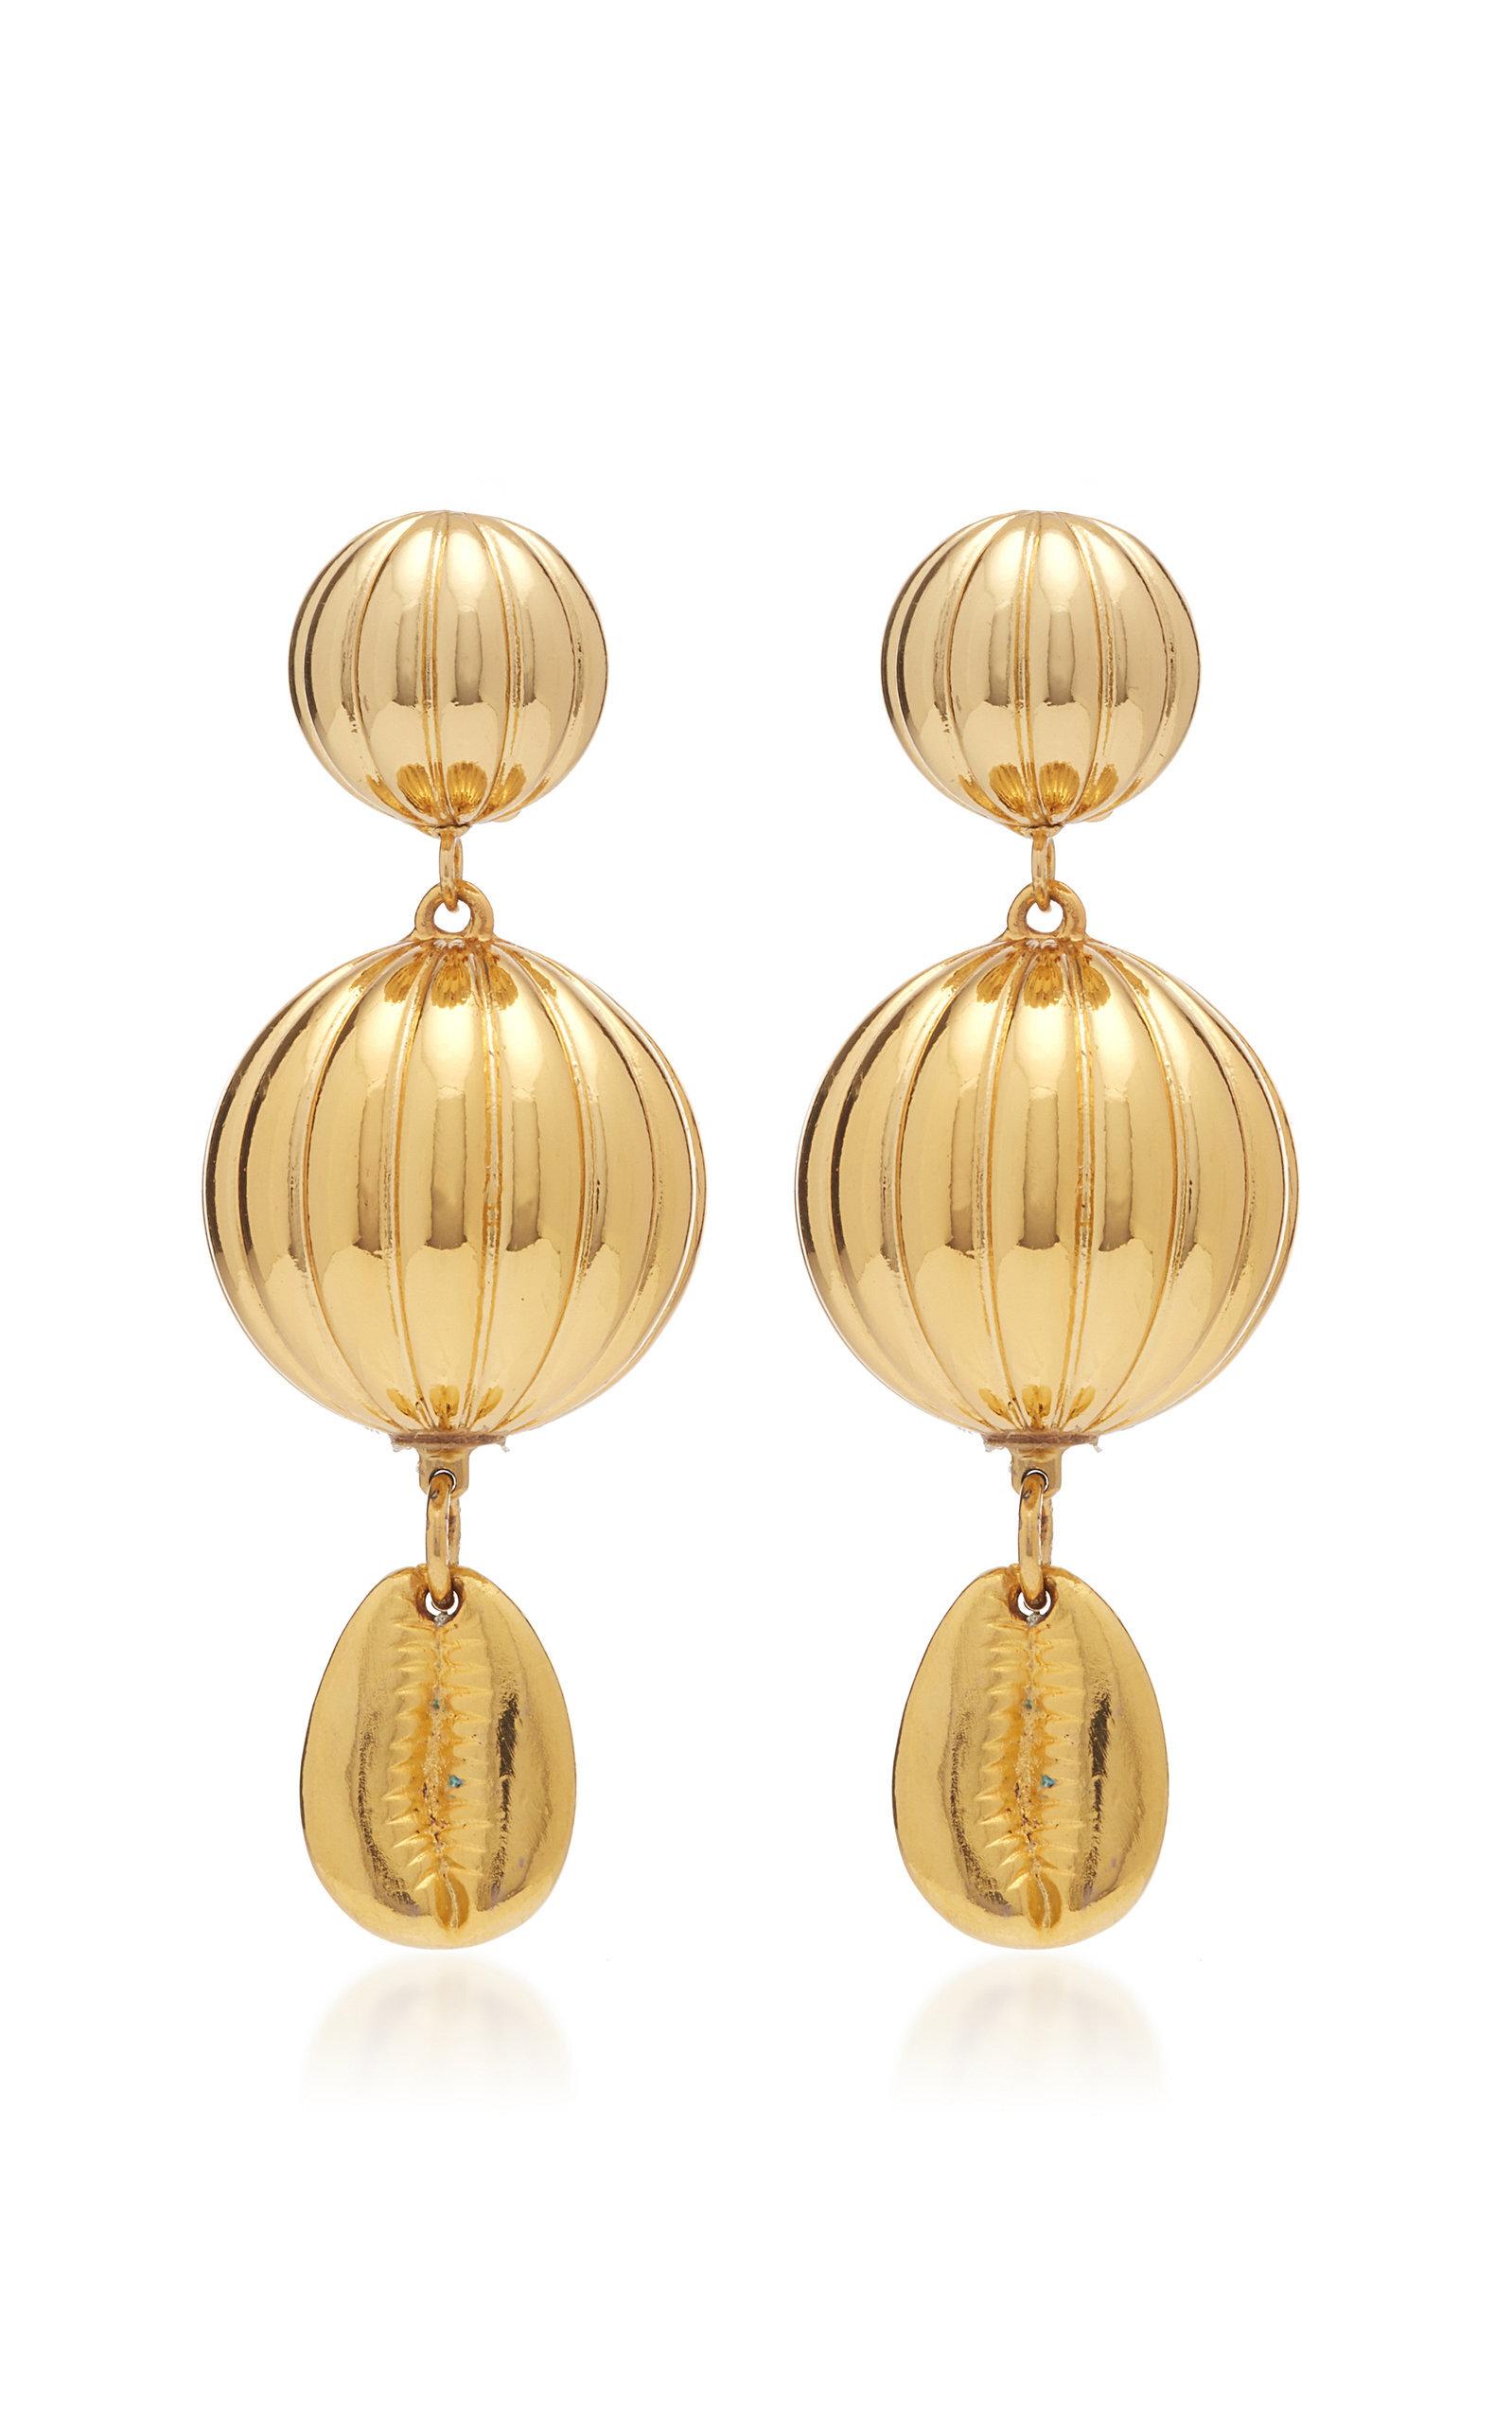 large_rebecca-de-ravenel-gold-be-charmed-gold-plated-earrings.jpg